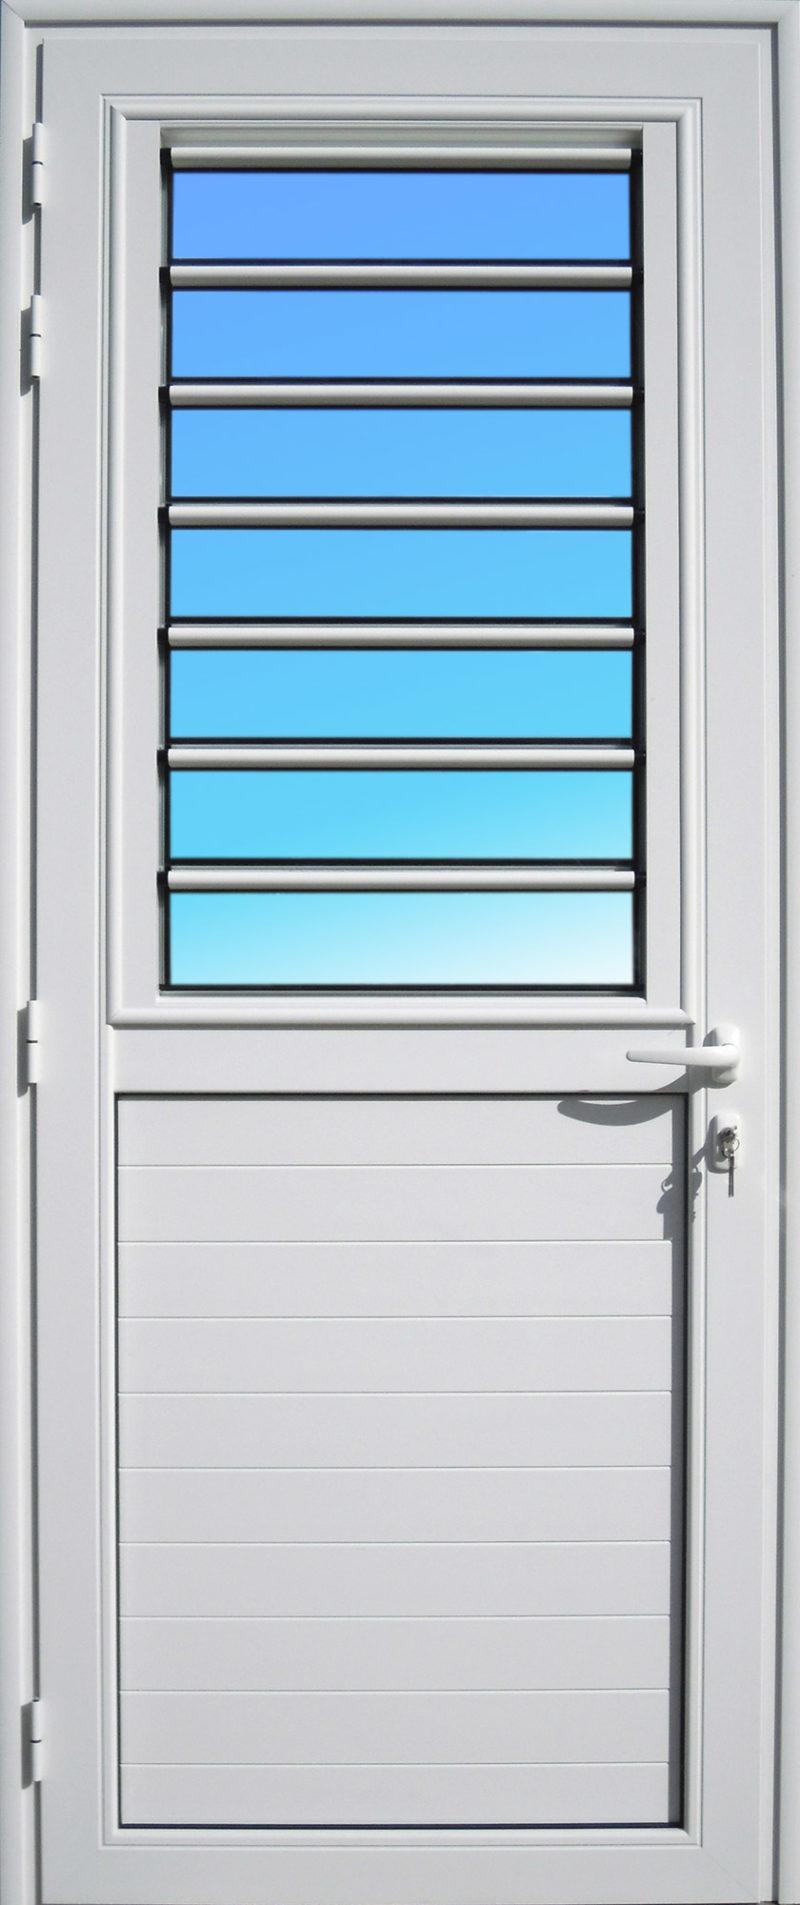 Porte aluminium laqué blanc PE15 MG ALUMINIUM de la gamme Alizés, avec jalousie fixe en lames de verre.